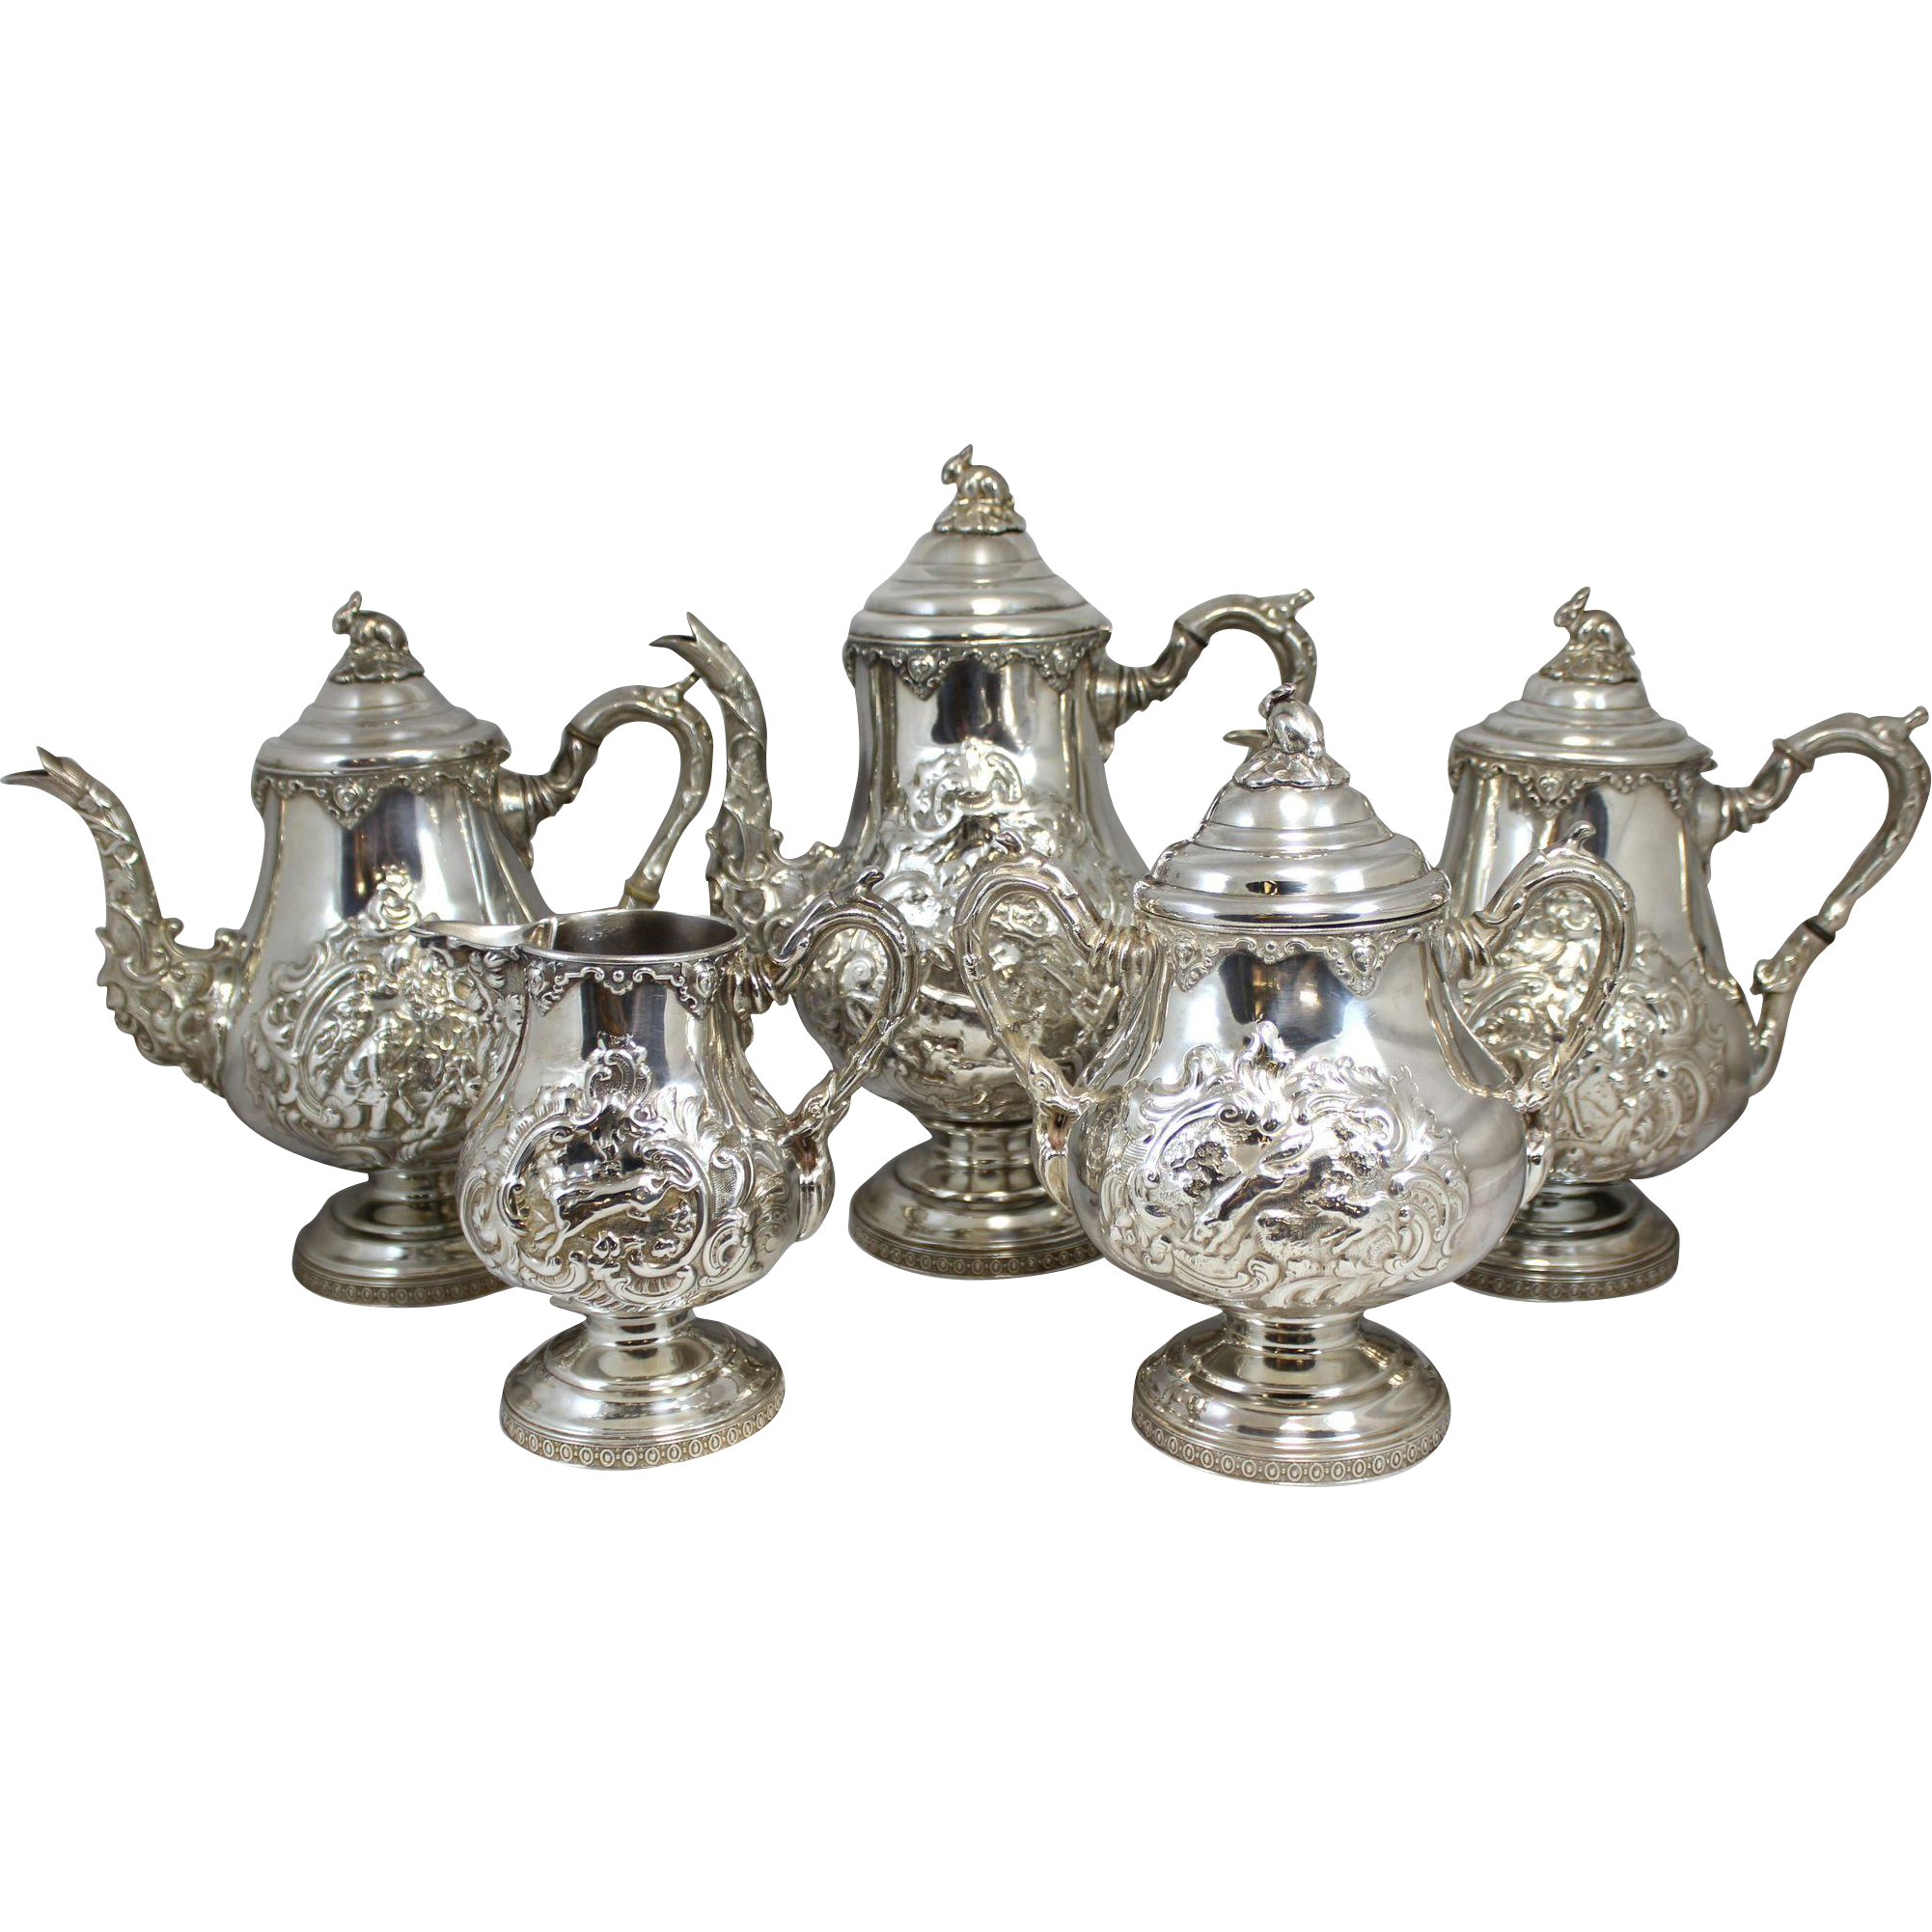 5 Pc Rogers Smith & Co Silver Plate Tea Service with Hunt Scenes circa 1857-1861